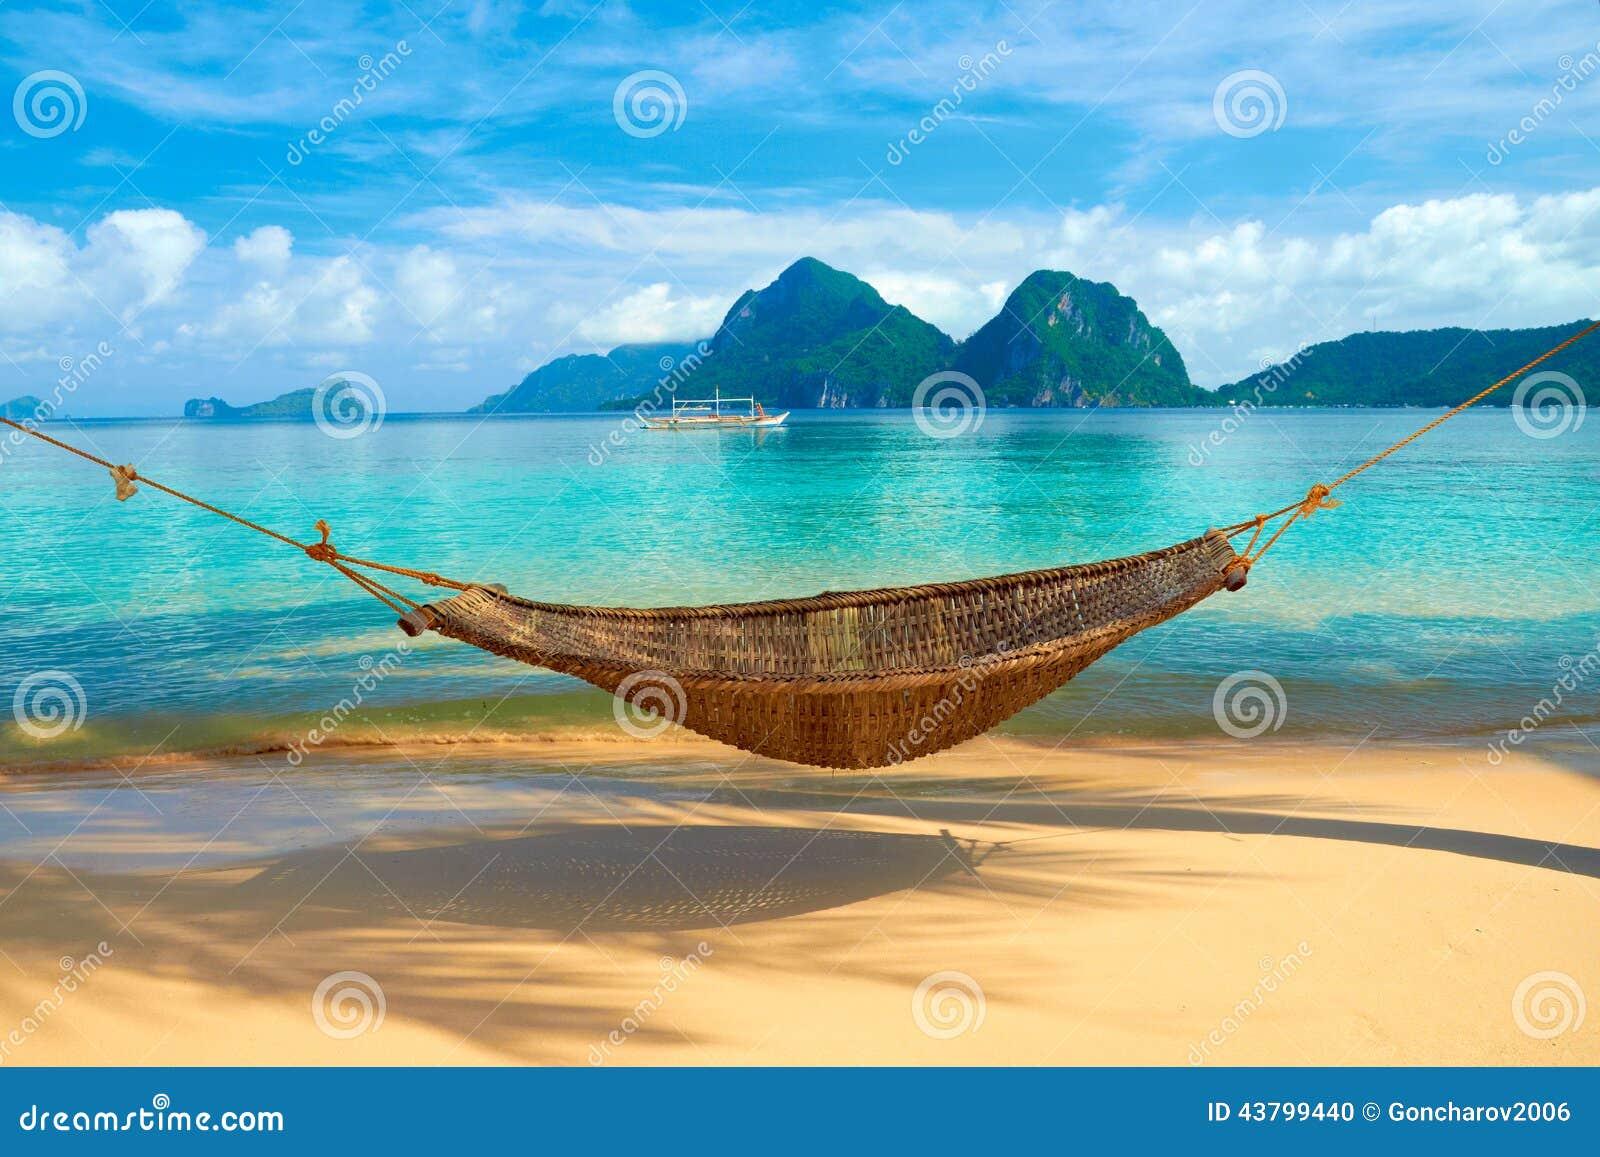 A Hammock at the Beach